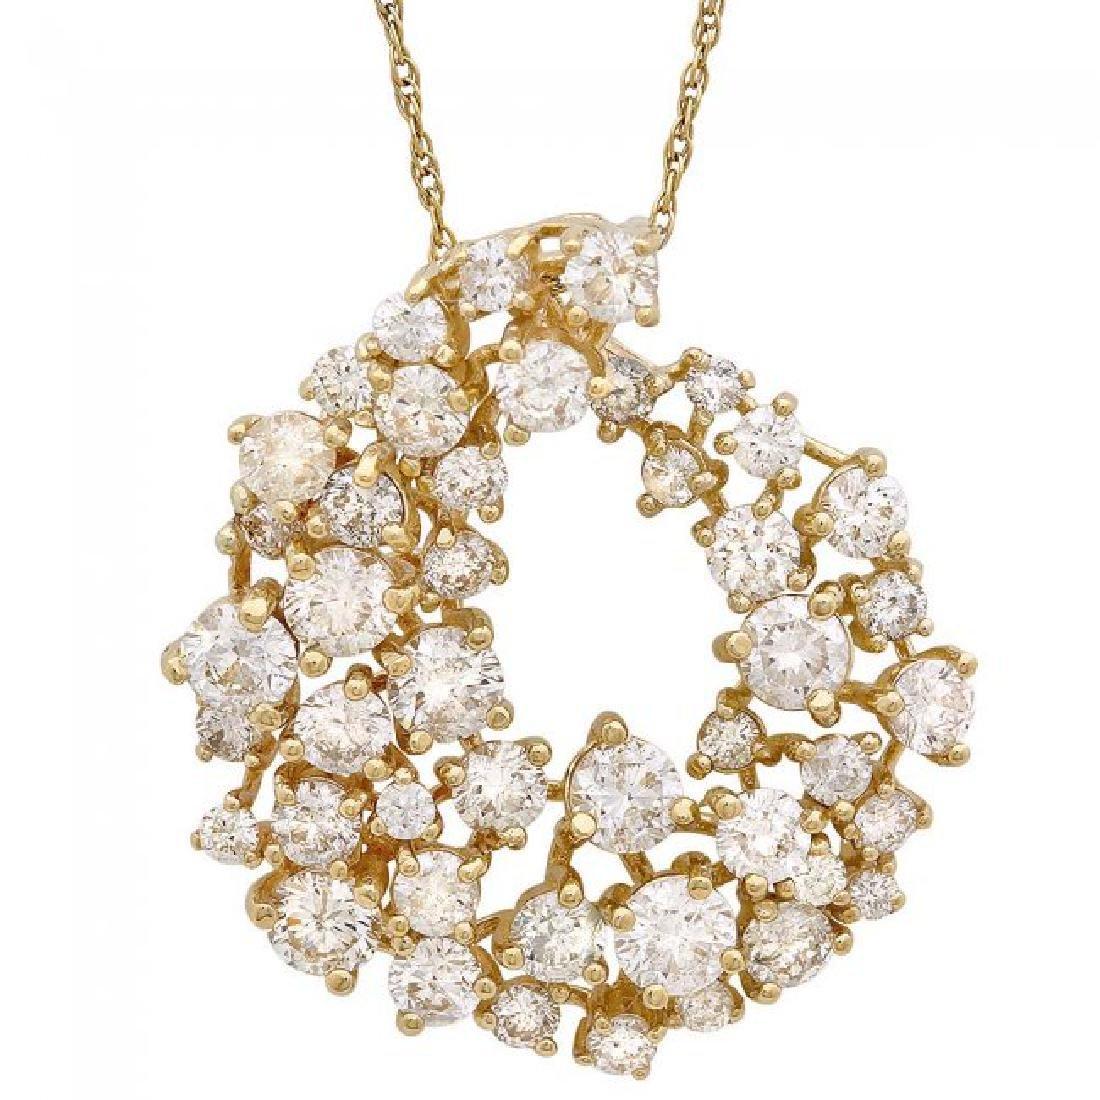 14k Yellow Gold 2.70ct Diamond Pendant - 2